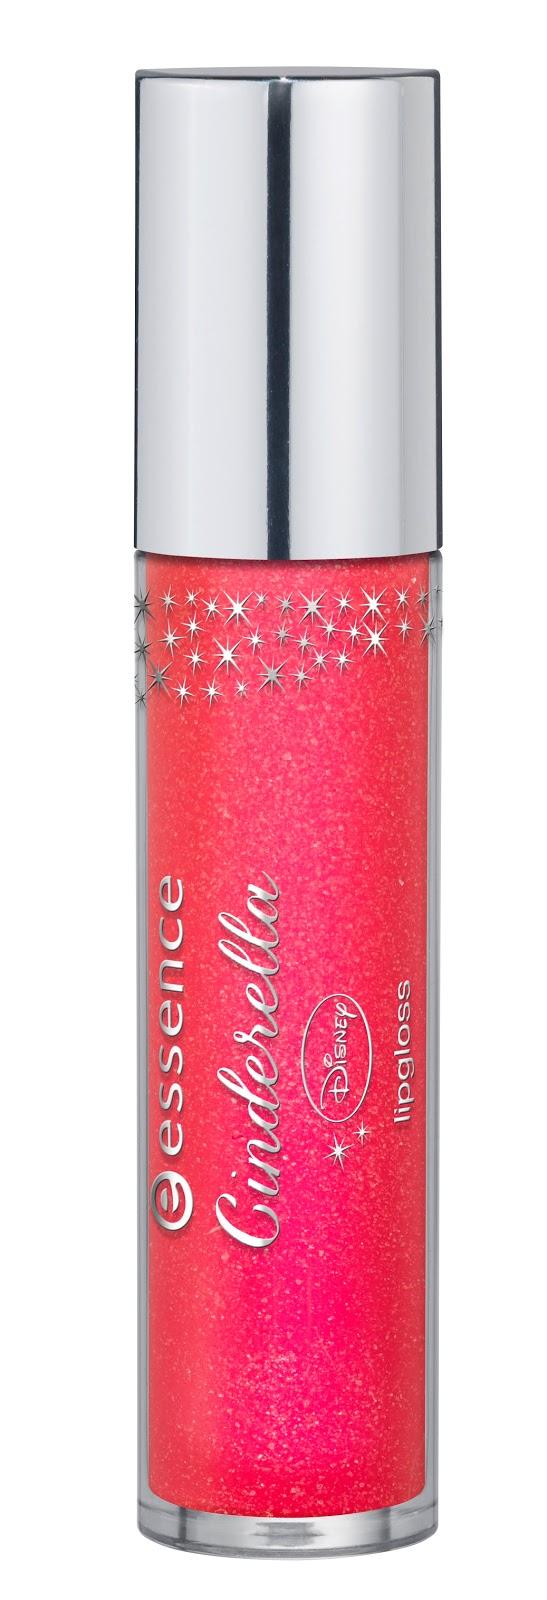 essence lipgloss cinderella